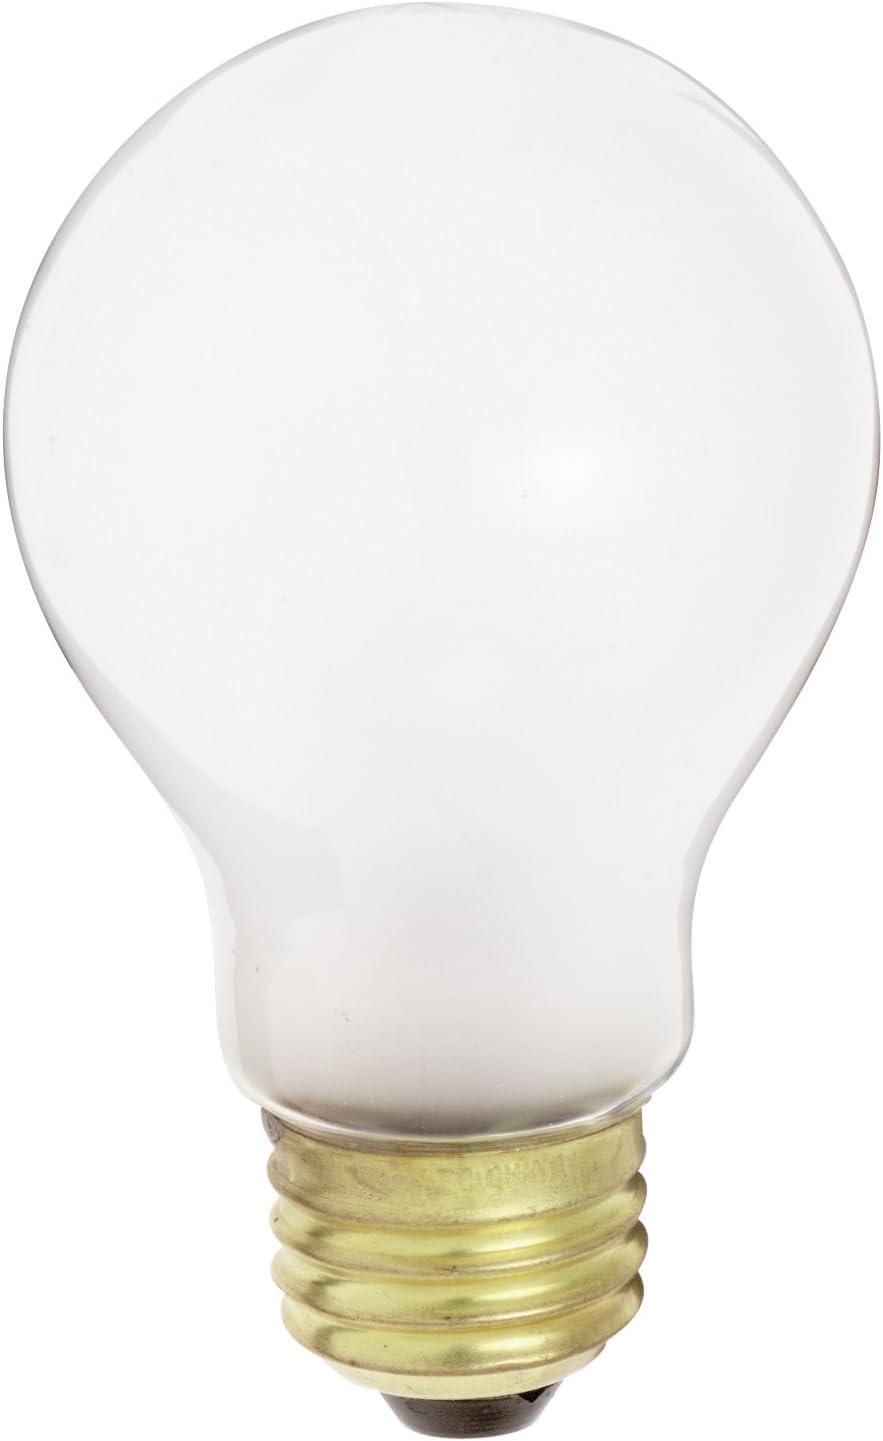 Frosted, Satco Products S5012 12-Volt 75-Watt A21 Medium Base Light Bulb